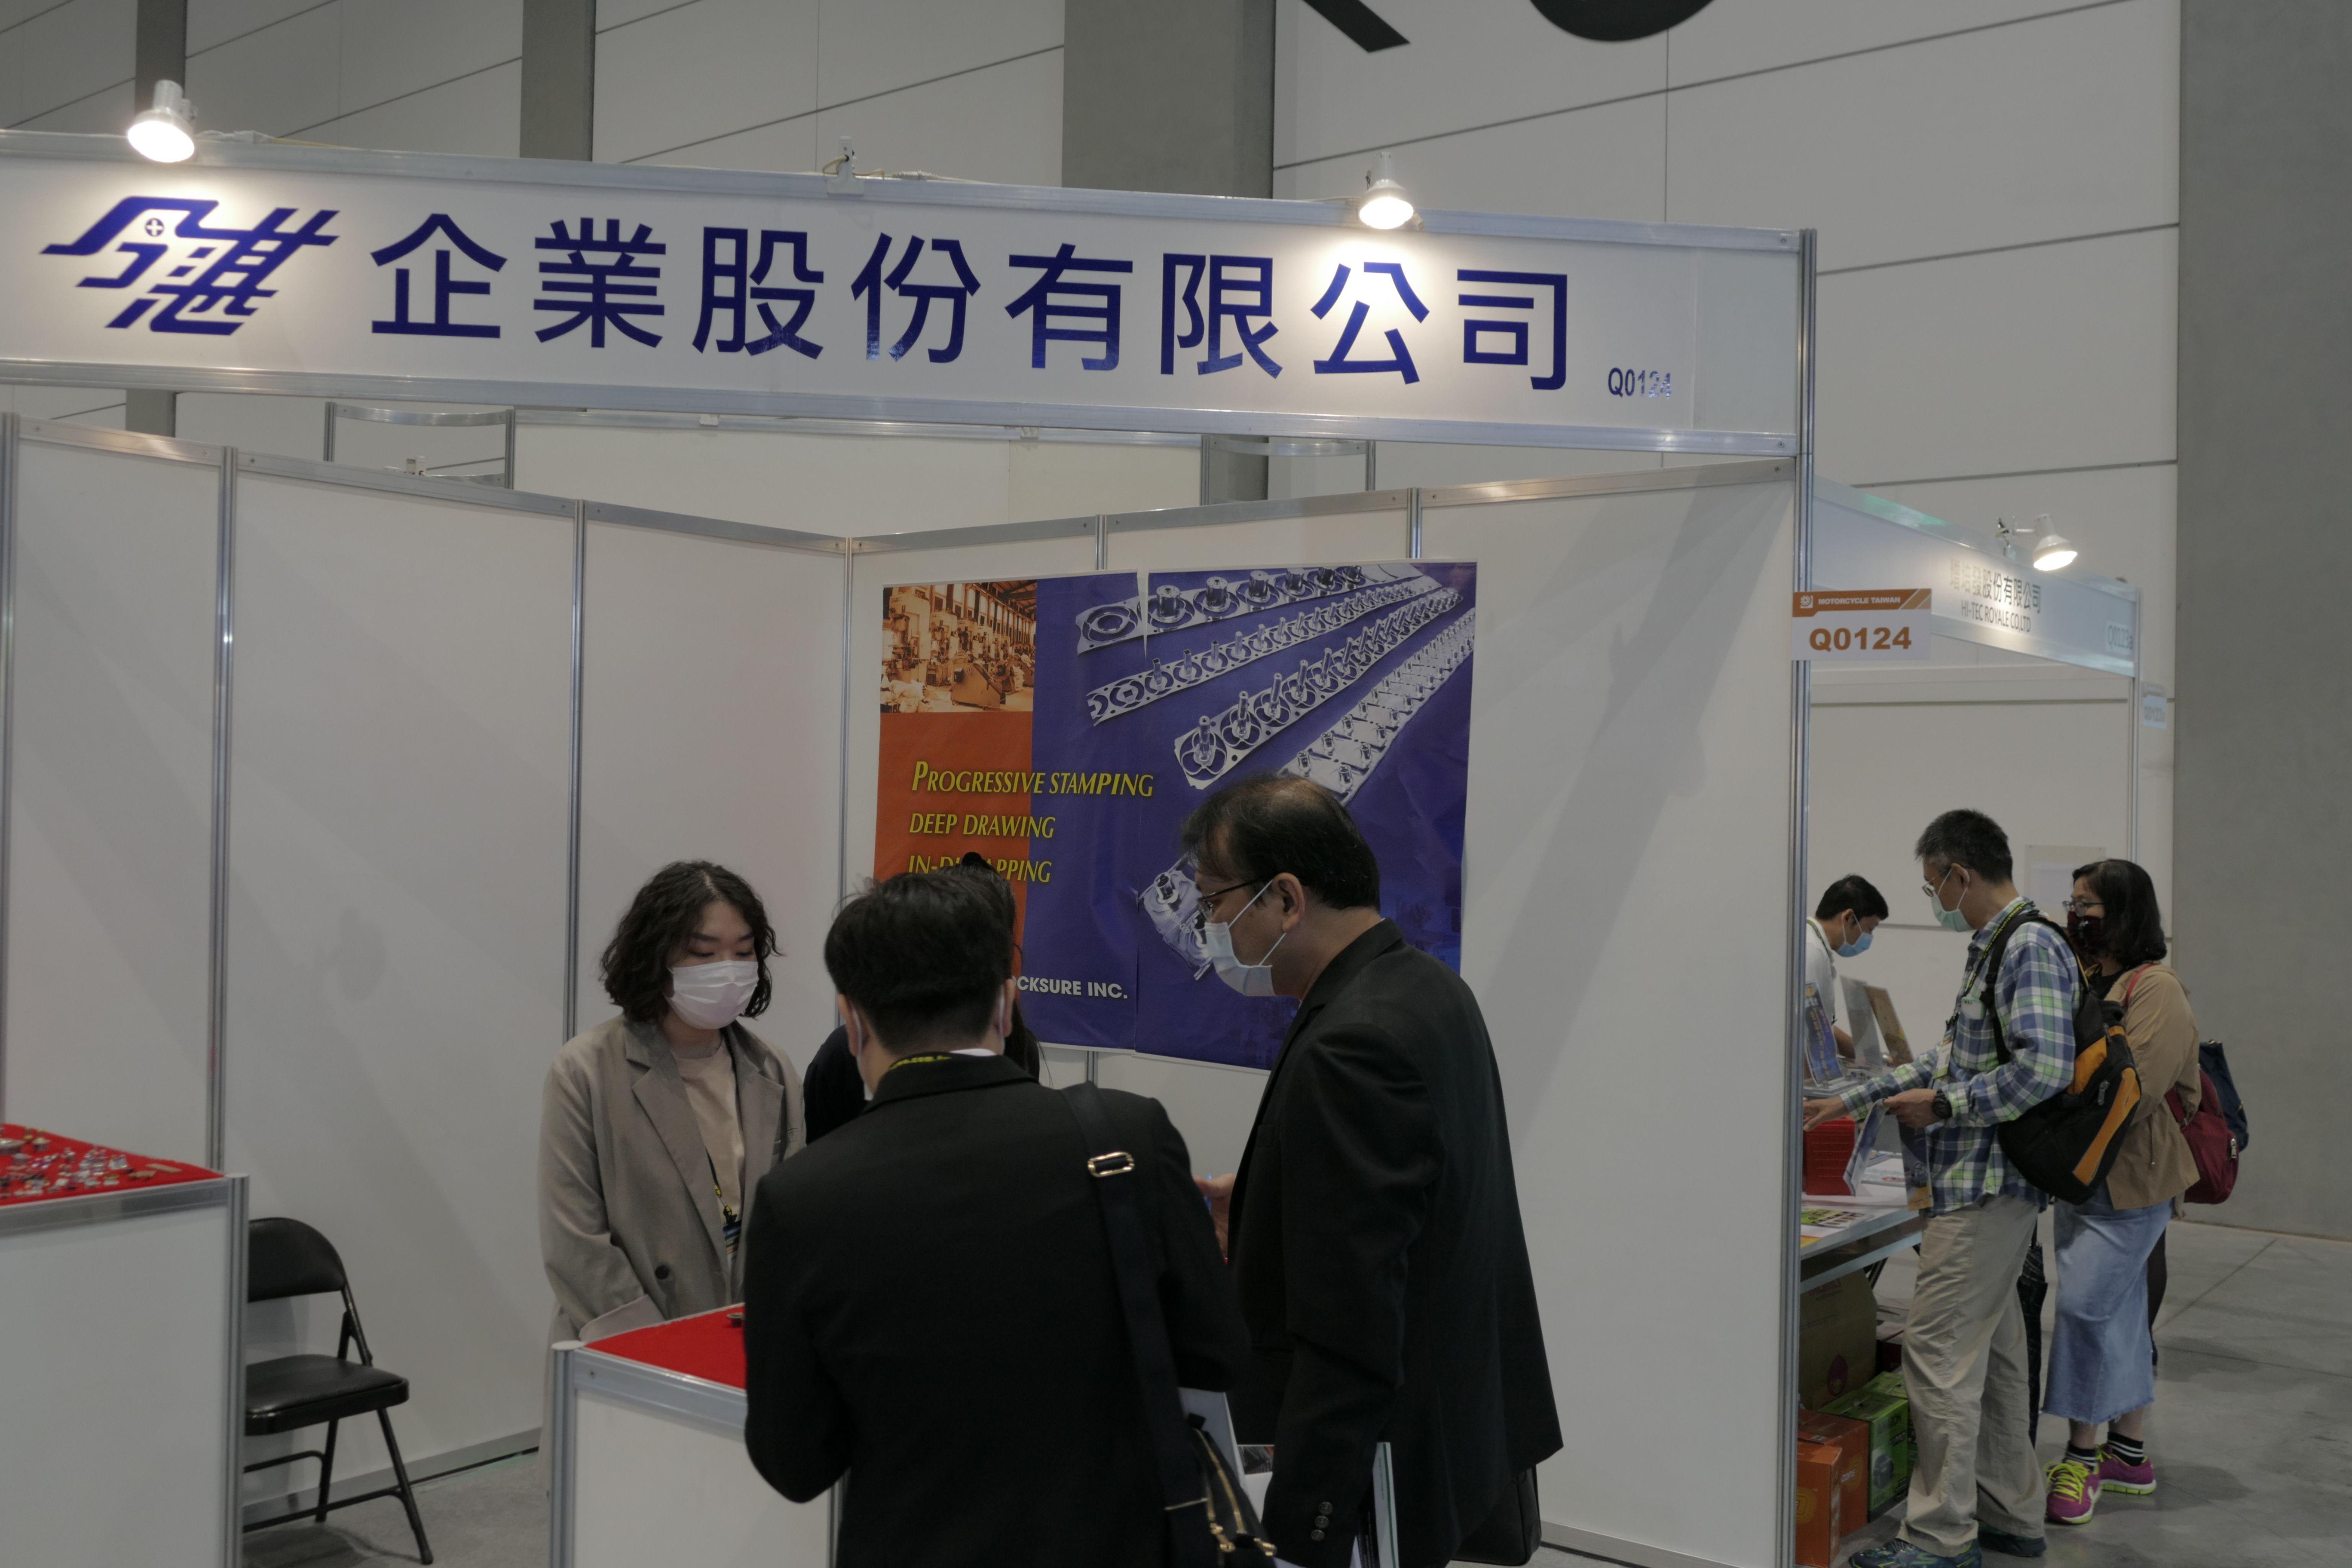 https://storage.googleapis.com/www.taiwantradeshow.com.tw/activity-photo/202010/T-54598096-name.jpg